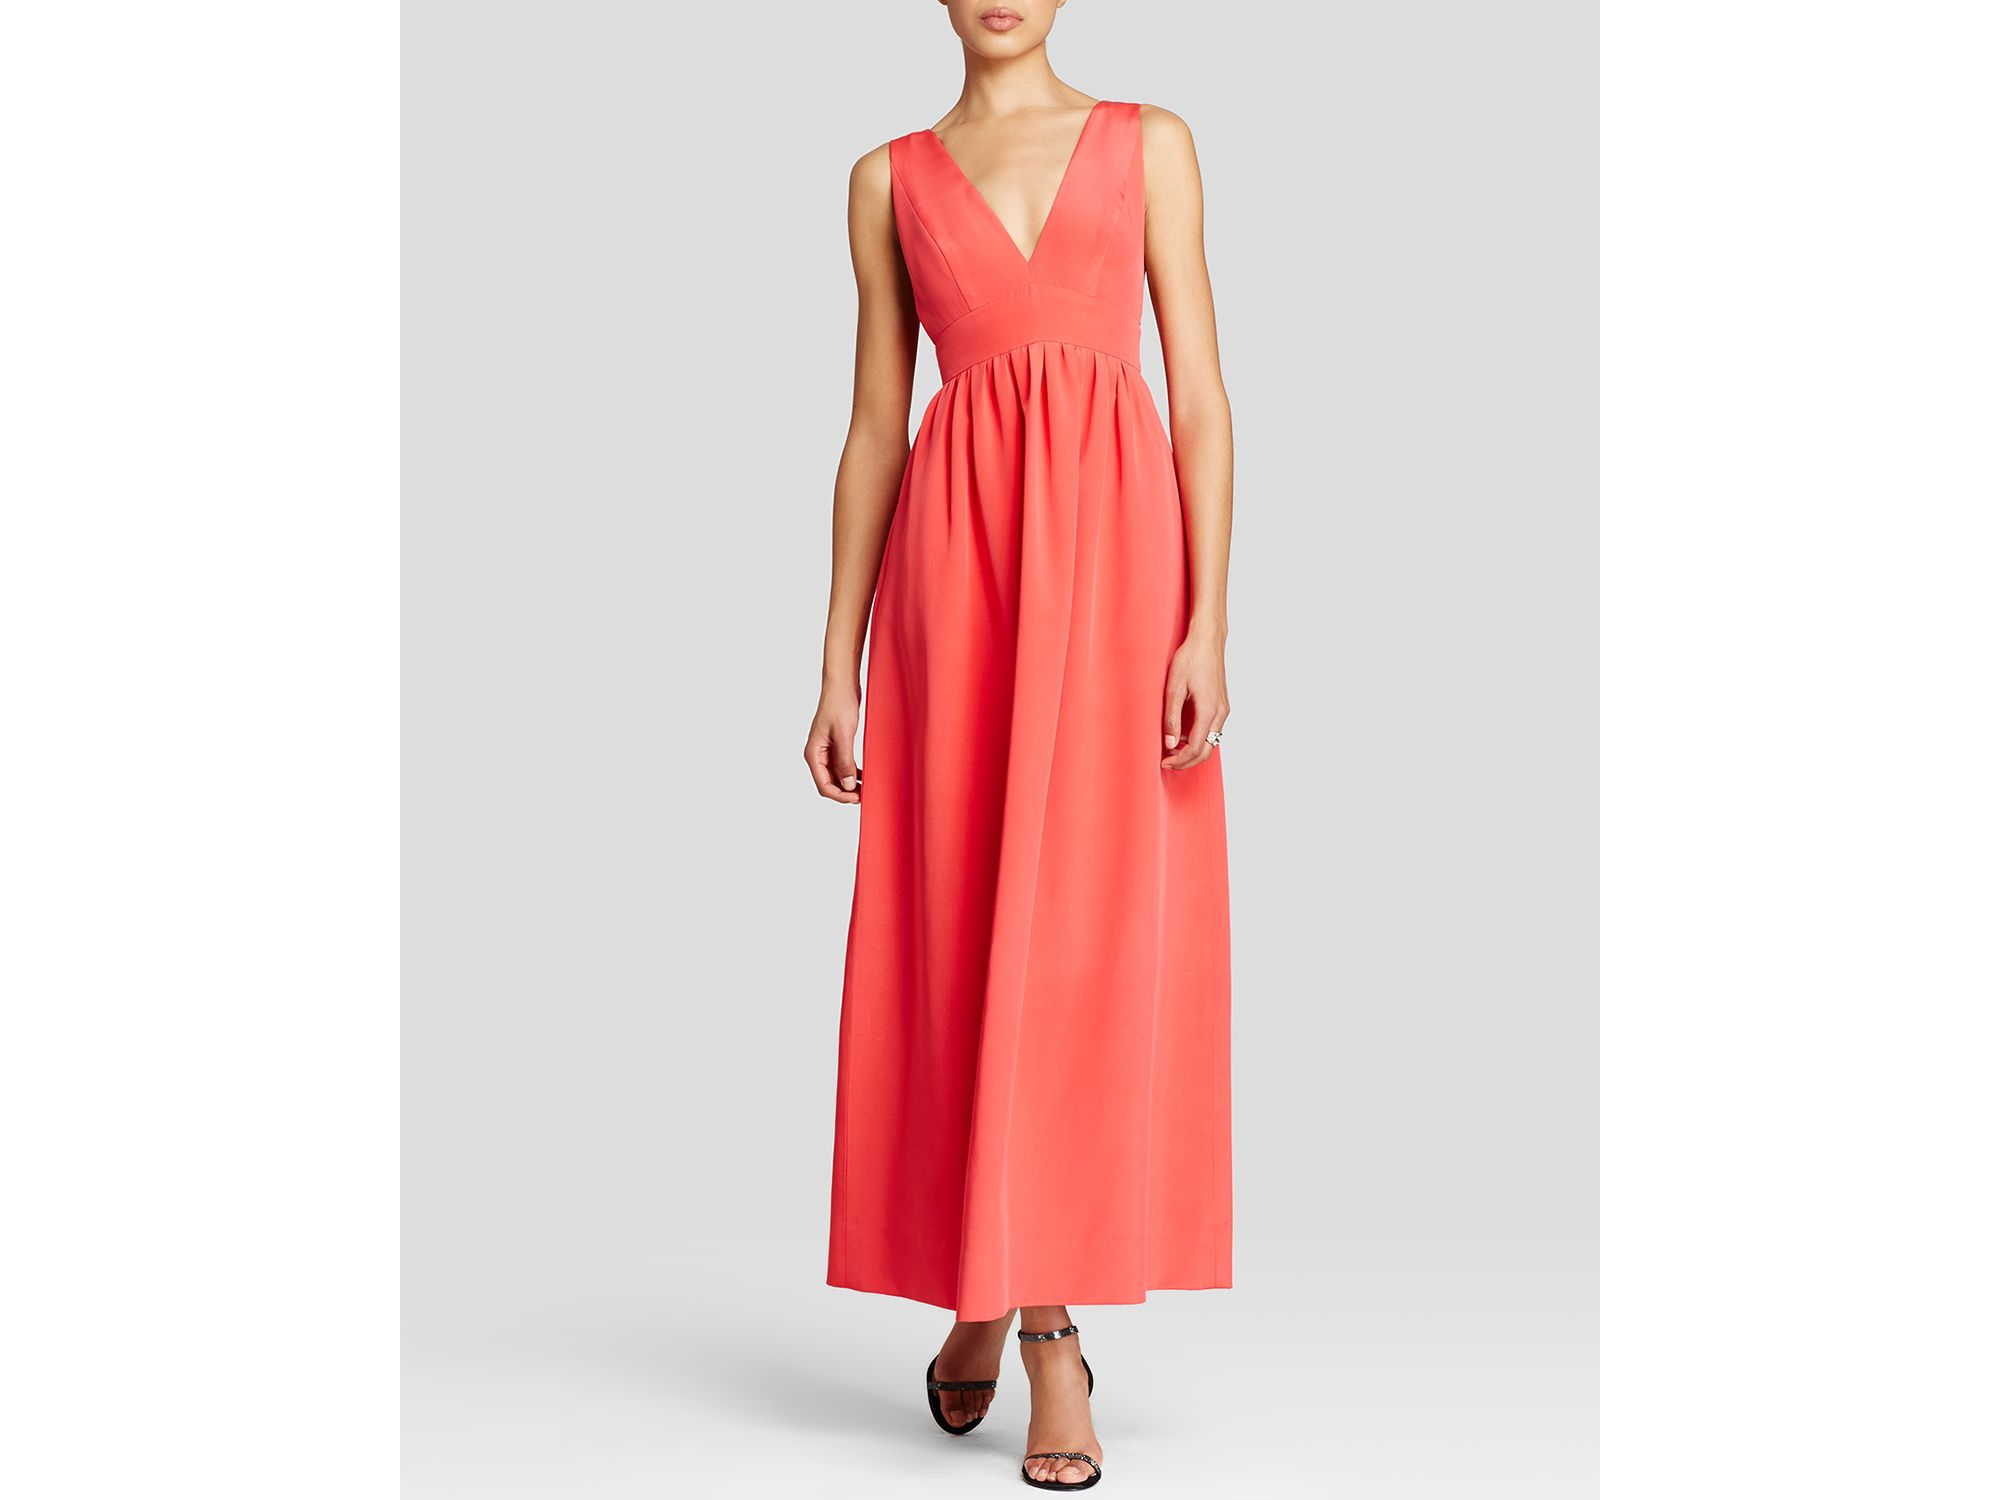 a886ebeabb4 Lyst - JILL Jill Stuart Deep Double V Crepe Gown - Bloomingdale s ...